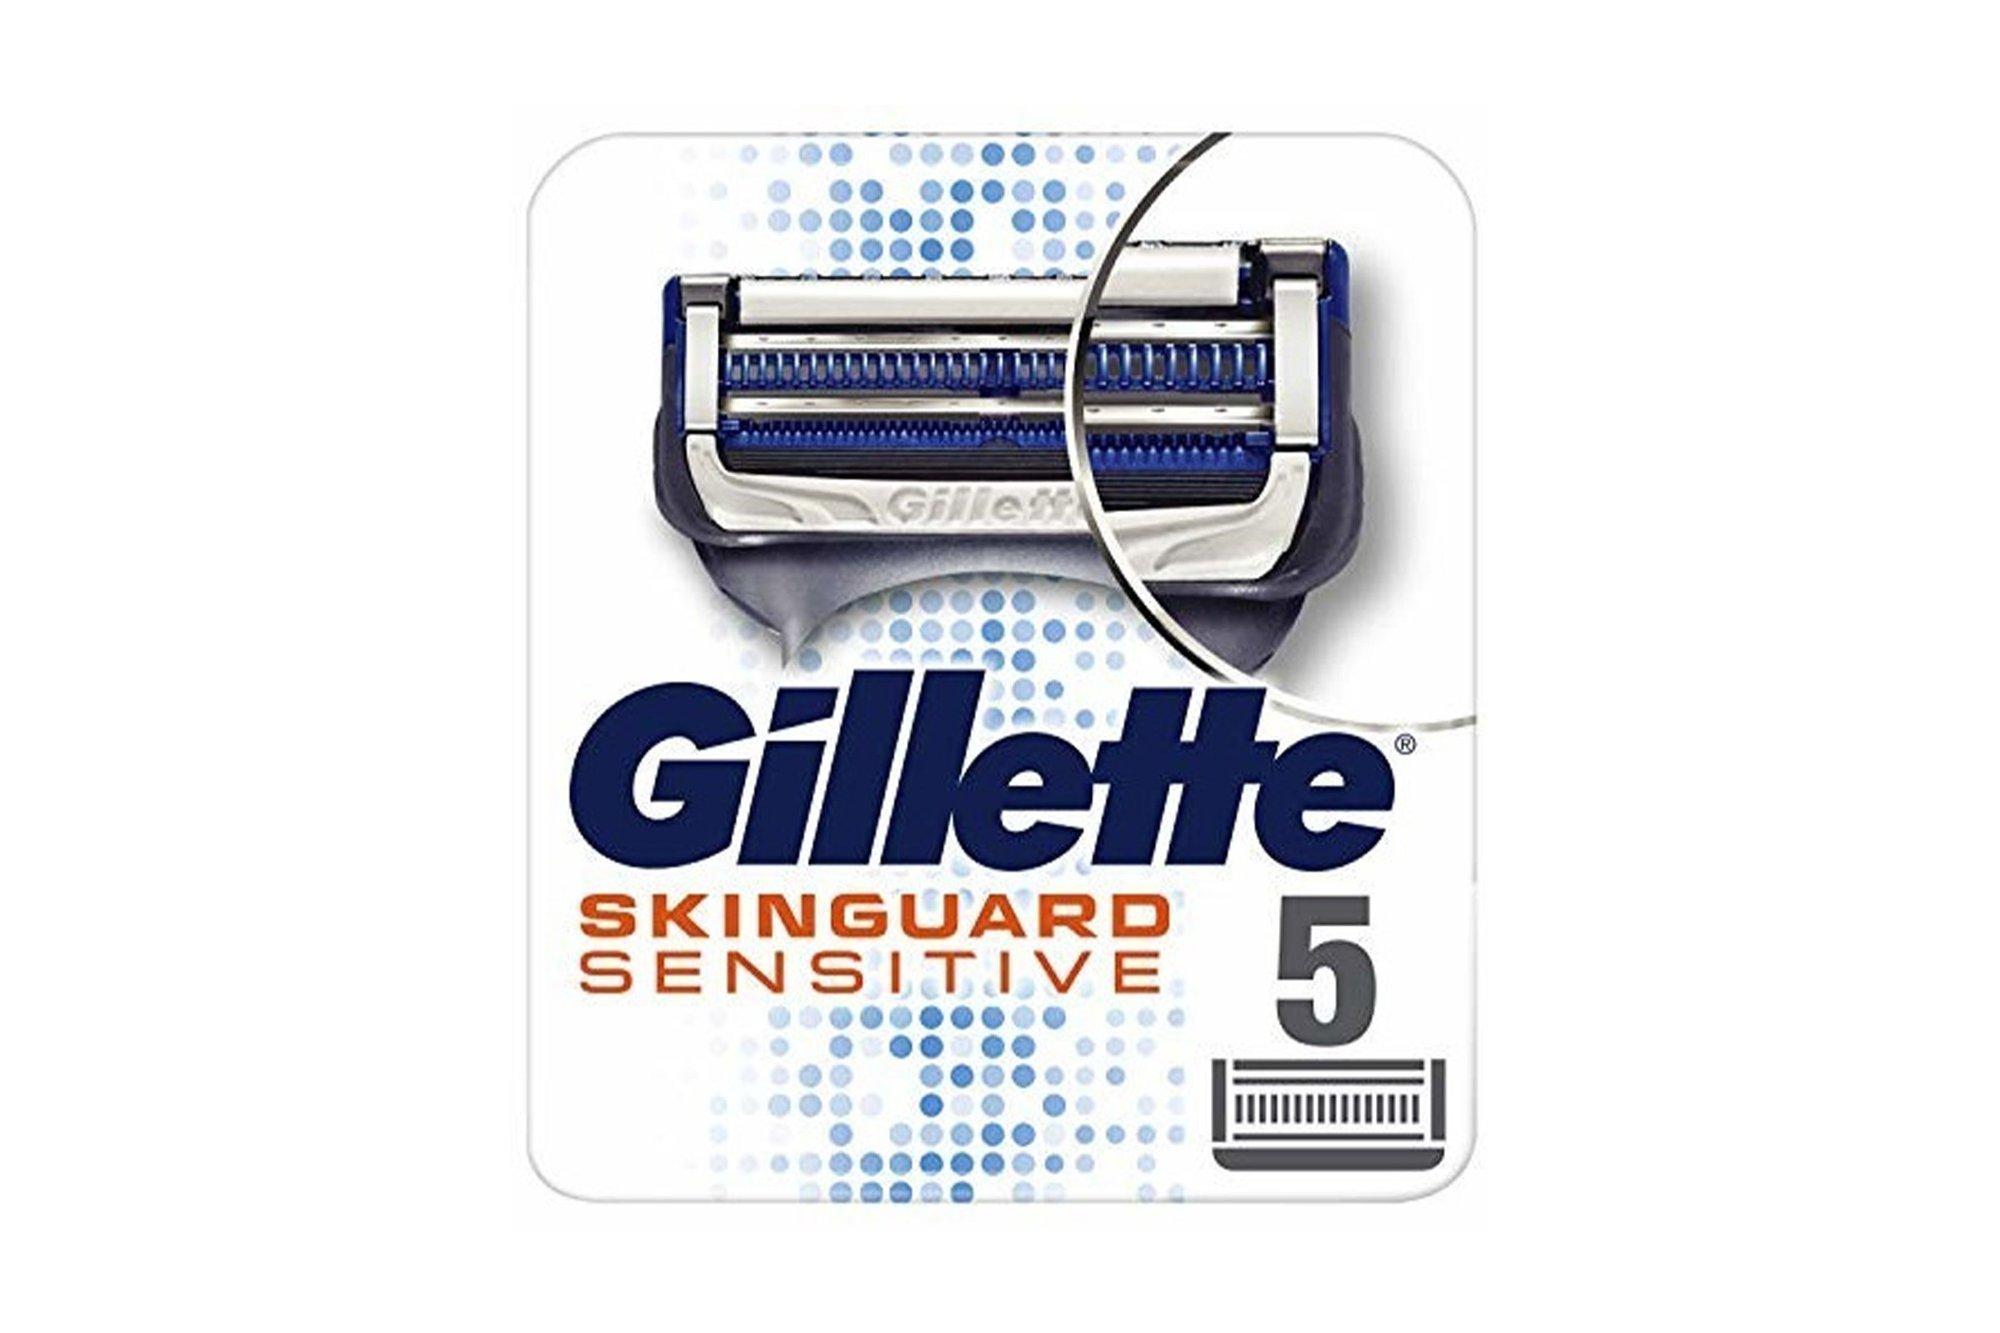 Ostrza wymienne Gillette Skinguard Sensitive 5 szt